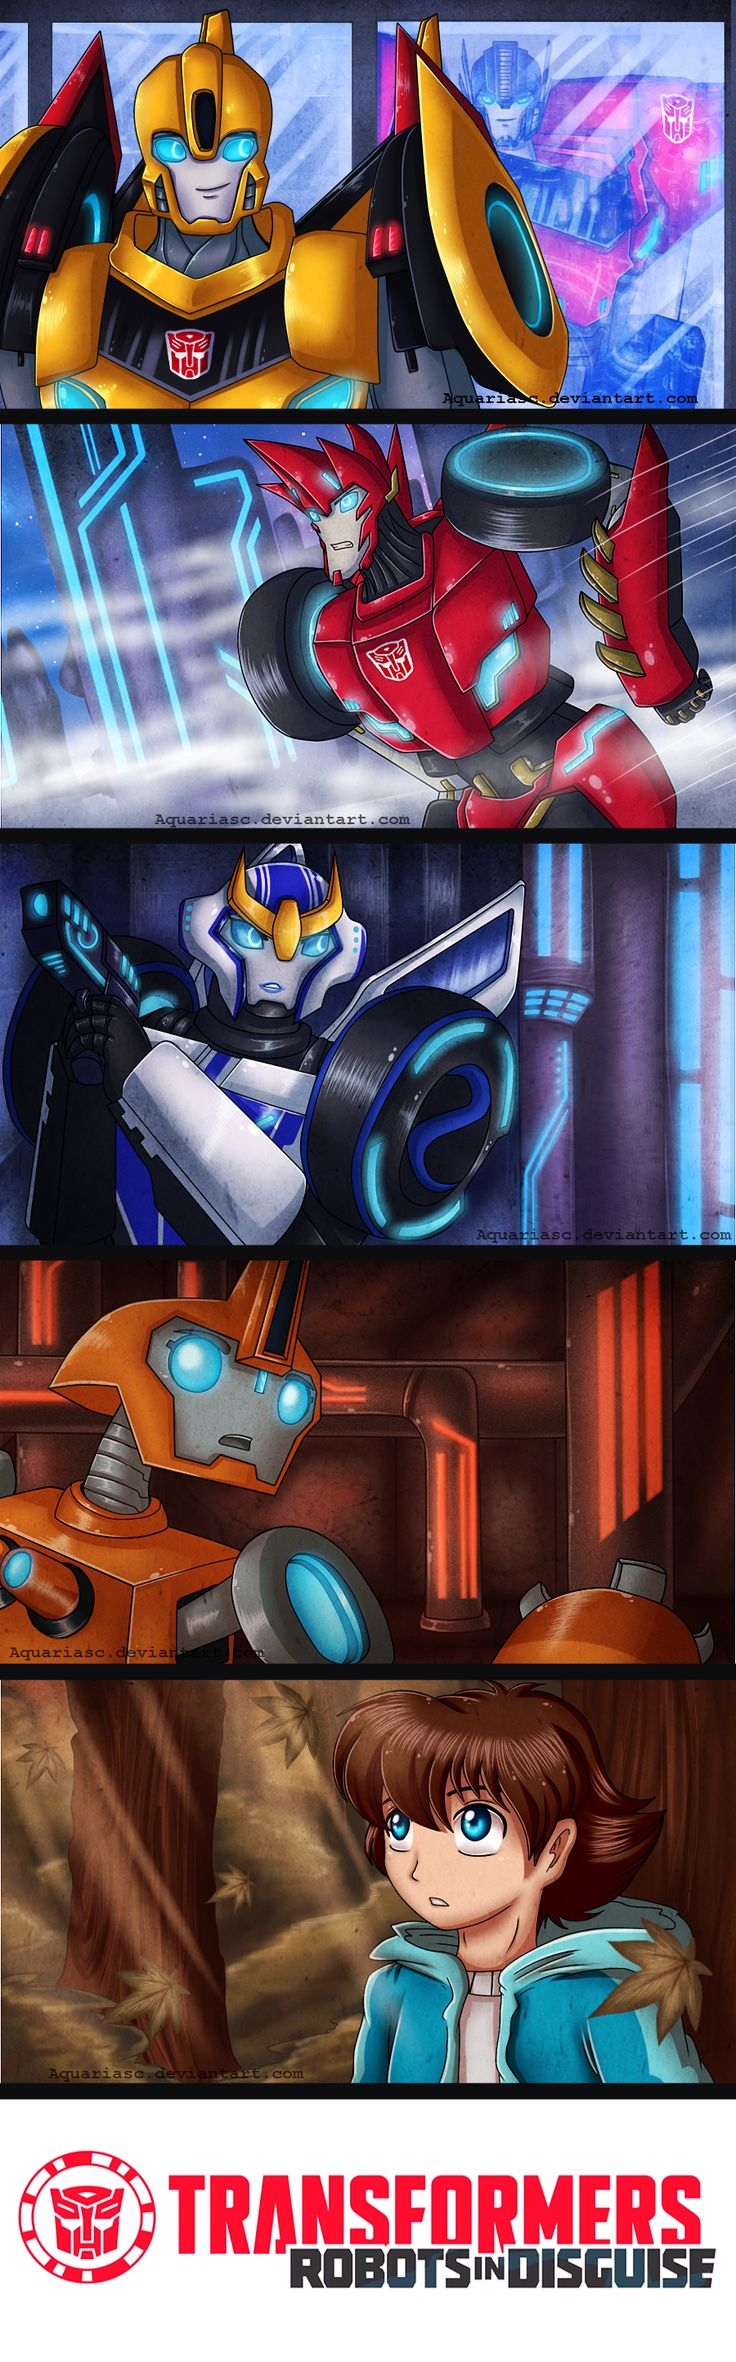 .: Transformers: Robots in Disguise 2015 :. by AquariaSC.deviantart.com  FIXIT SO CUTE !!!!!!!